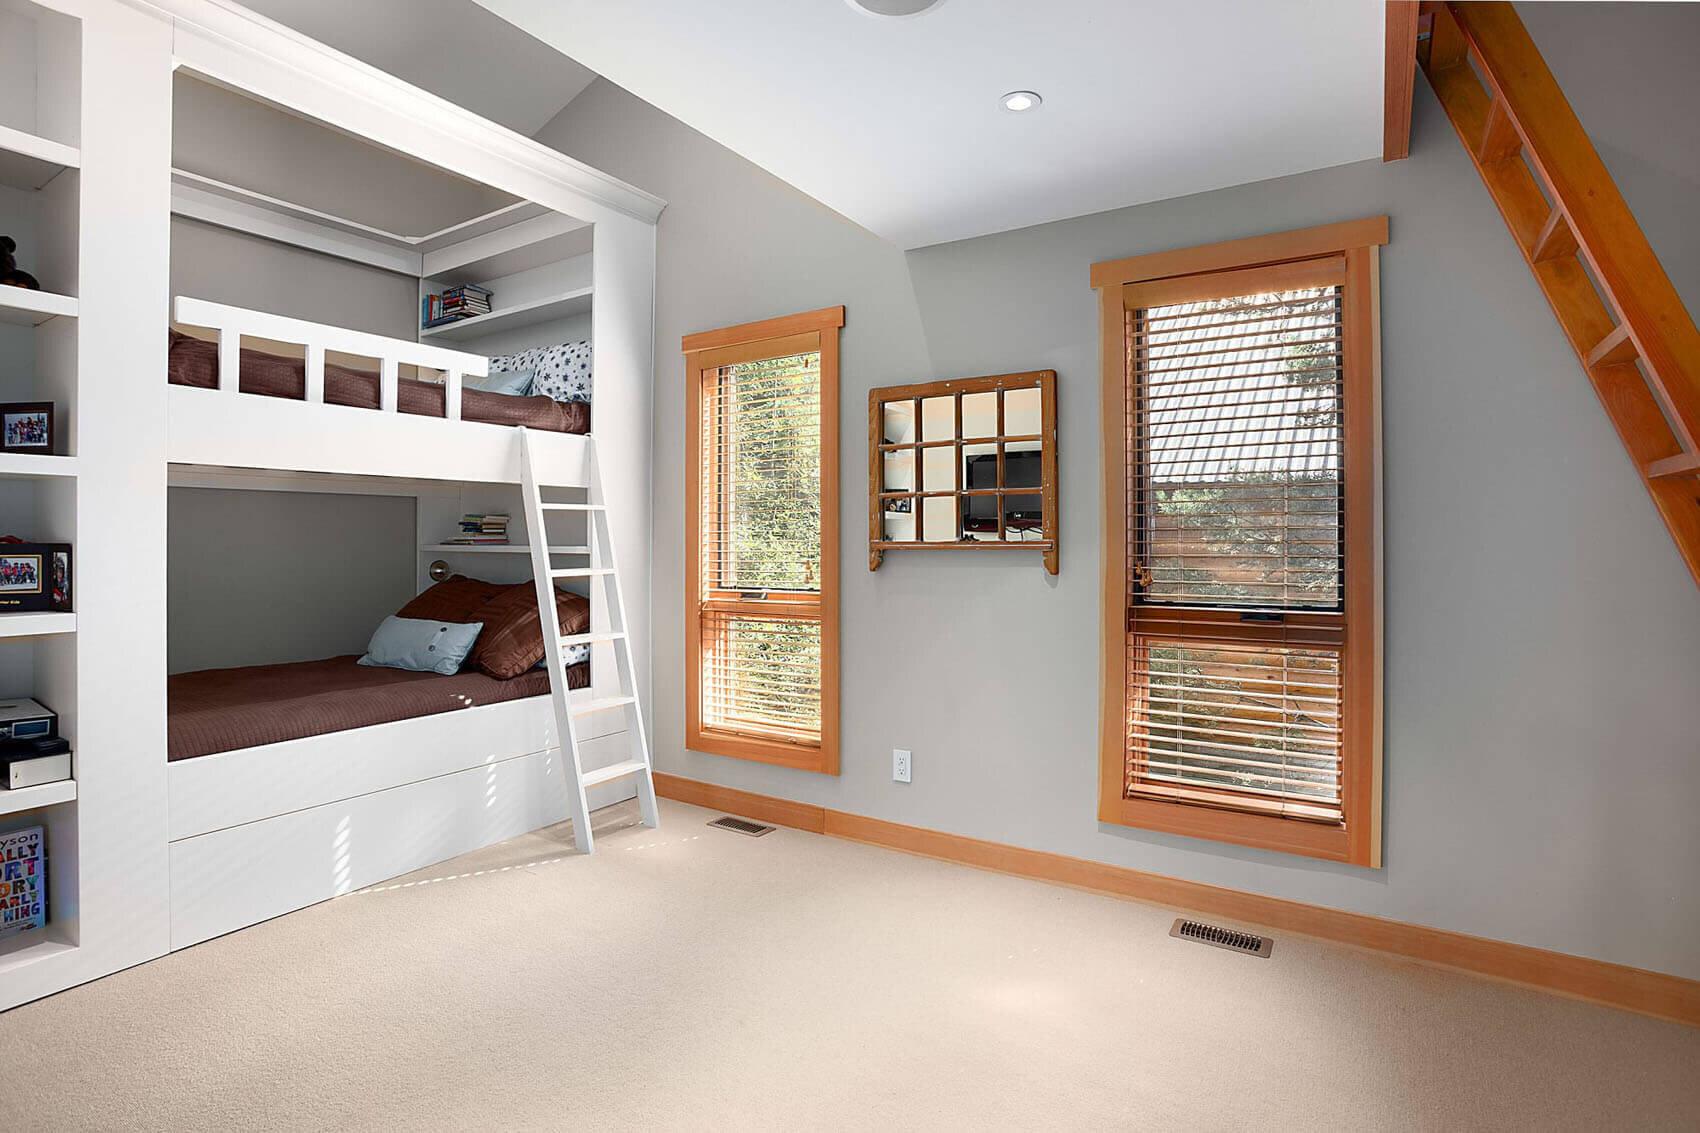 wsi-imageoptim-Whistler-kids-bedroom-reno.jpg